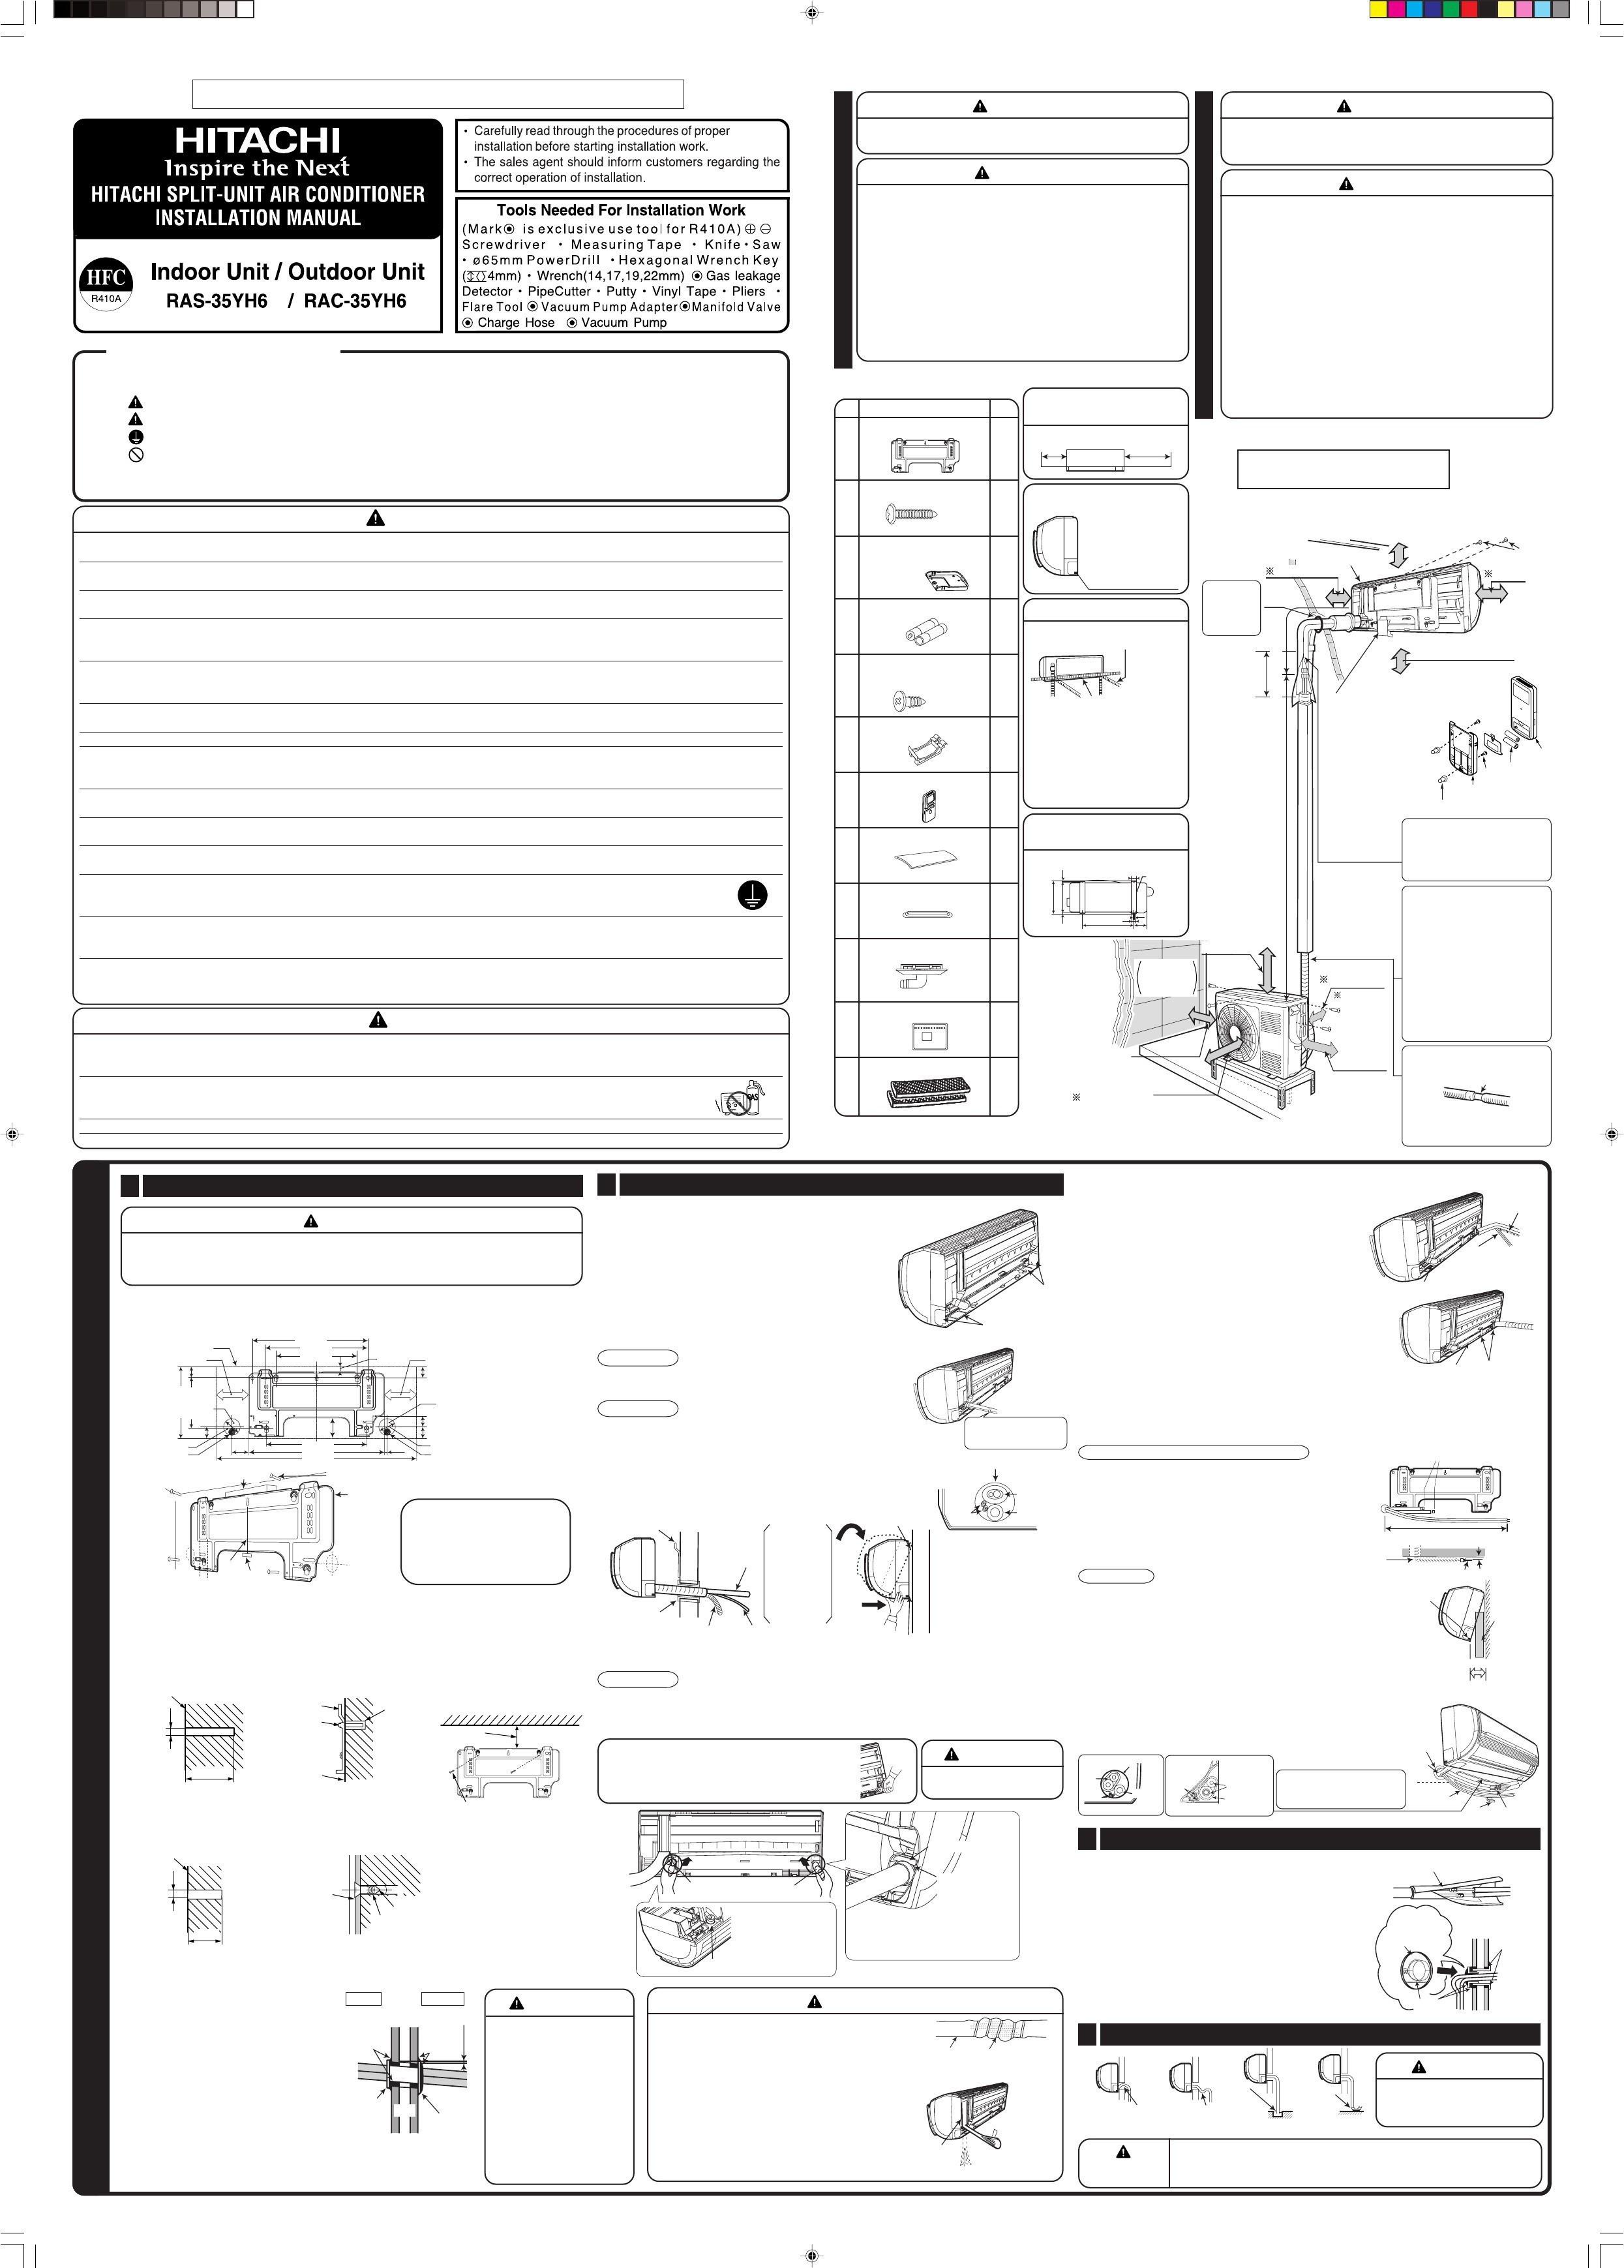 Car Air Conditioner Diagram Central Air Conditioner Wiring Diagram 2018 Wiring Diagram for Home Of Car Air Conditioner Diagram